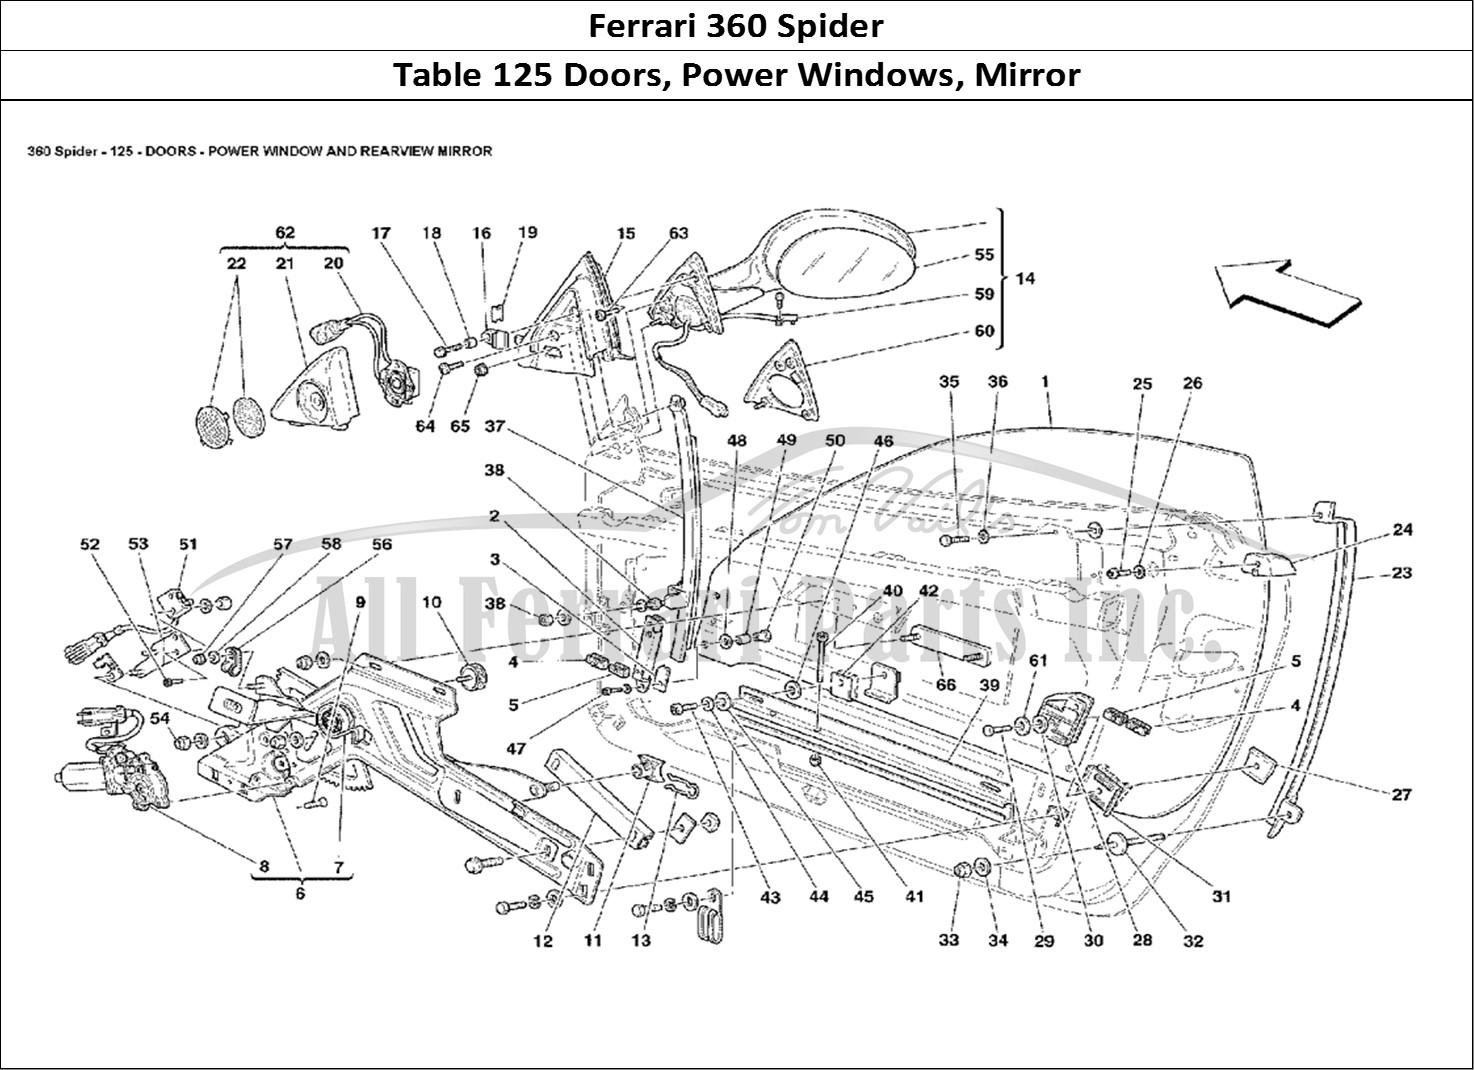 Buy Original Ferrari 360 Spider 125 Doors Power Windows